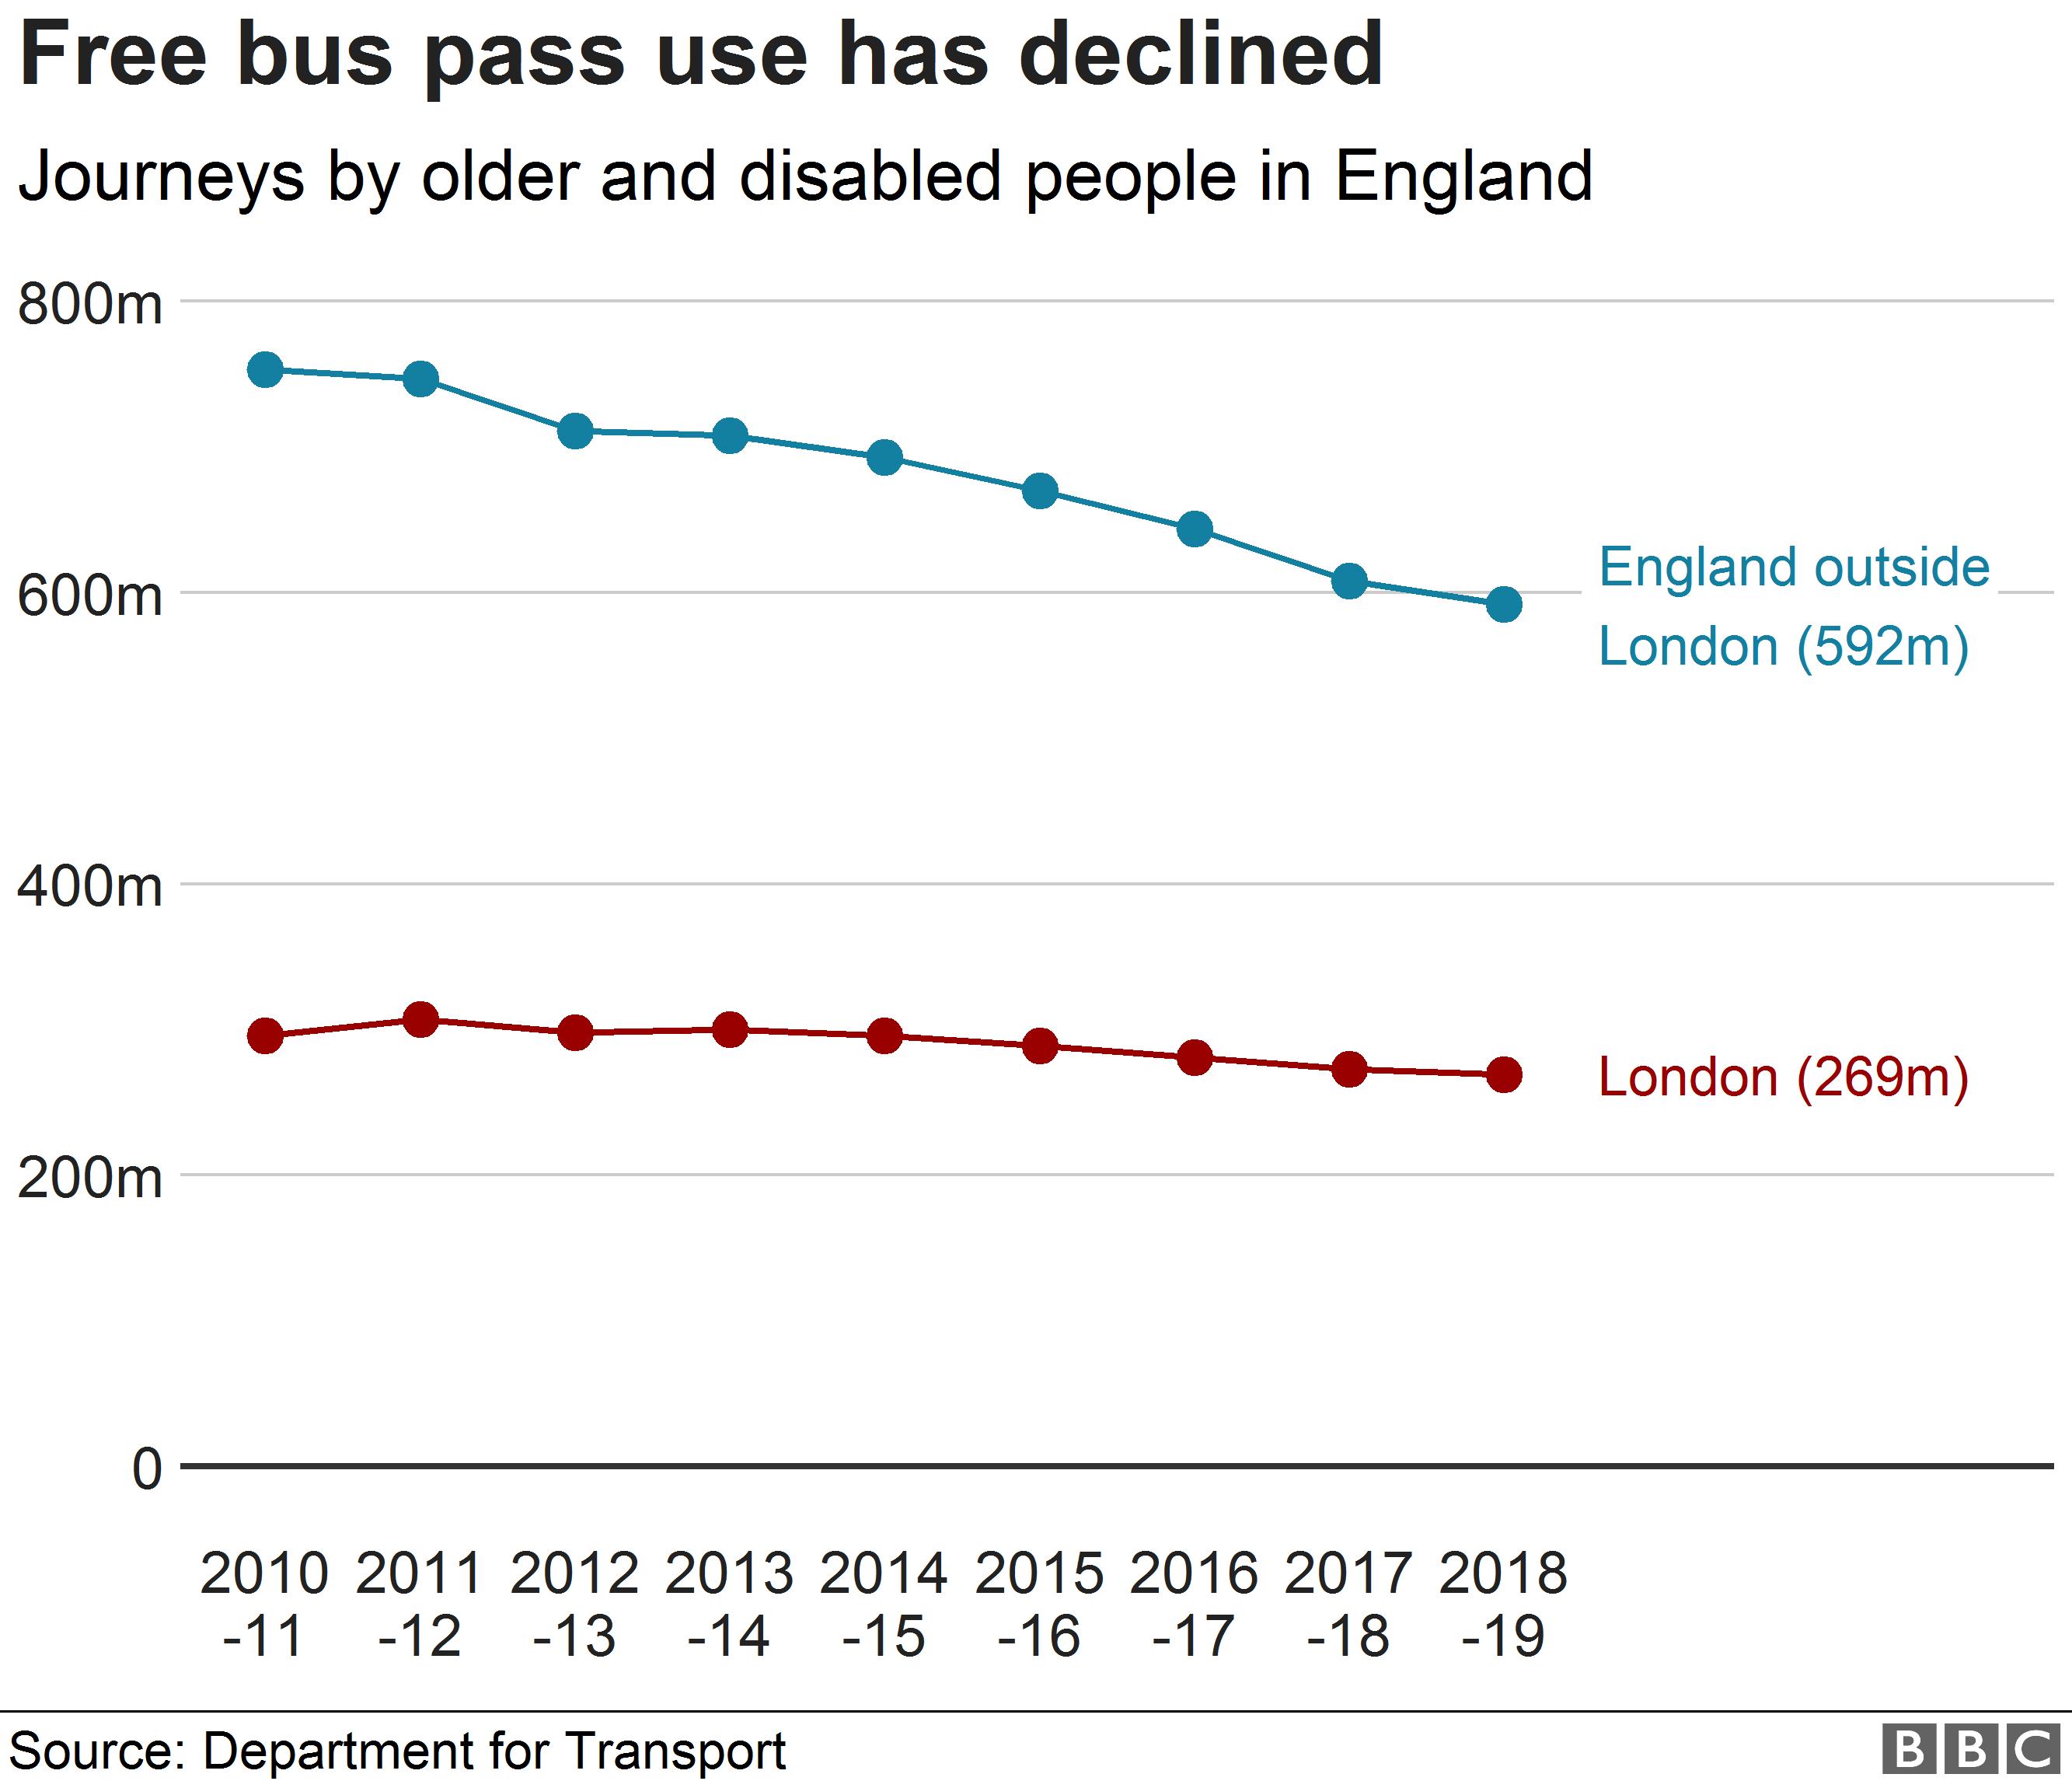 Free bus pass use line chart